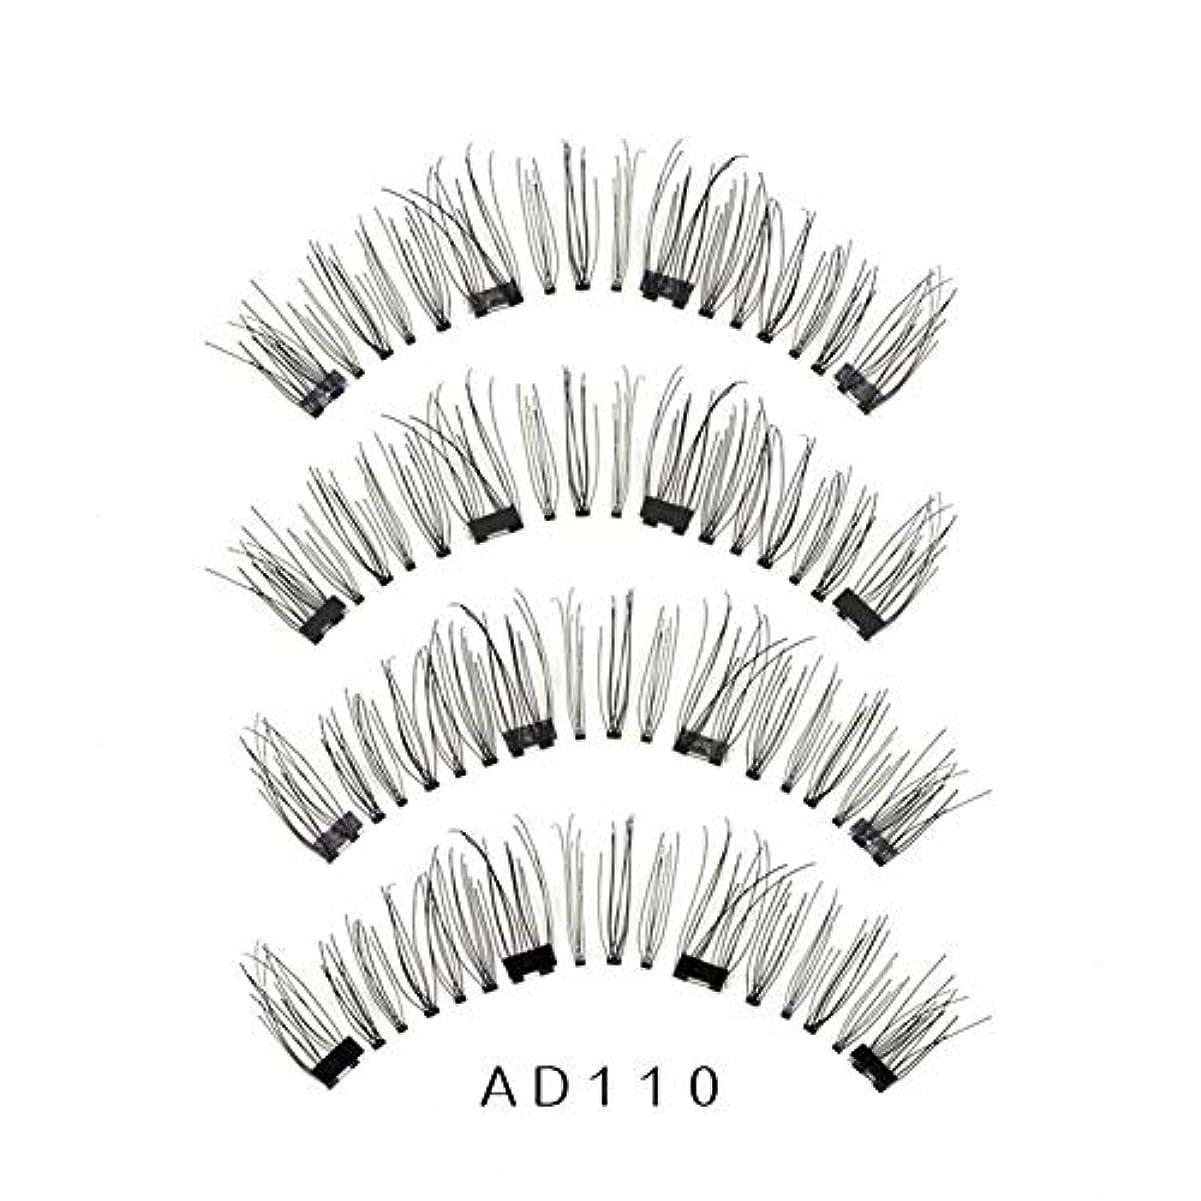 Viugreum つけまつげ 磁気まつげ 4つ磁石 つけまつ毛 3D 極薄 超軽量高級繊維 軽量 つけまつ 接着剤ない 手作り 人気